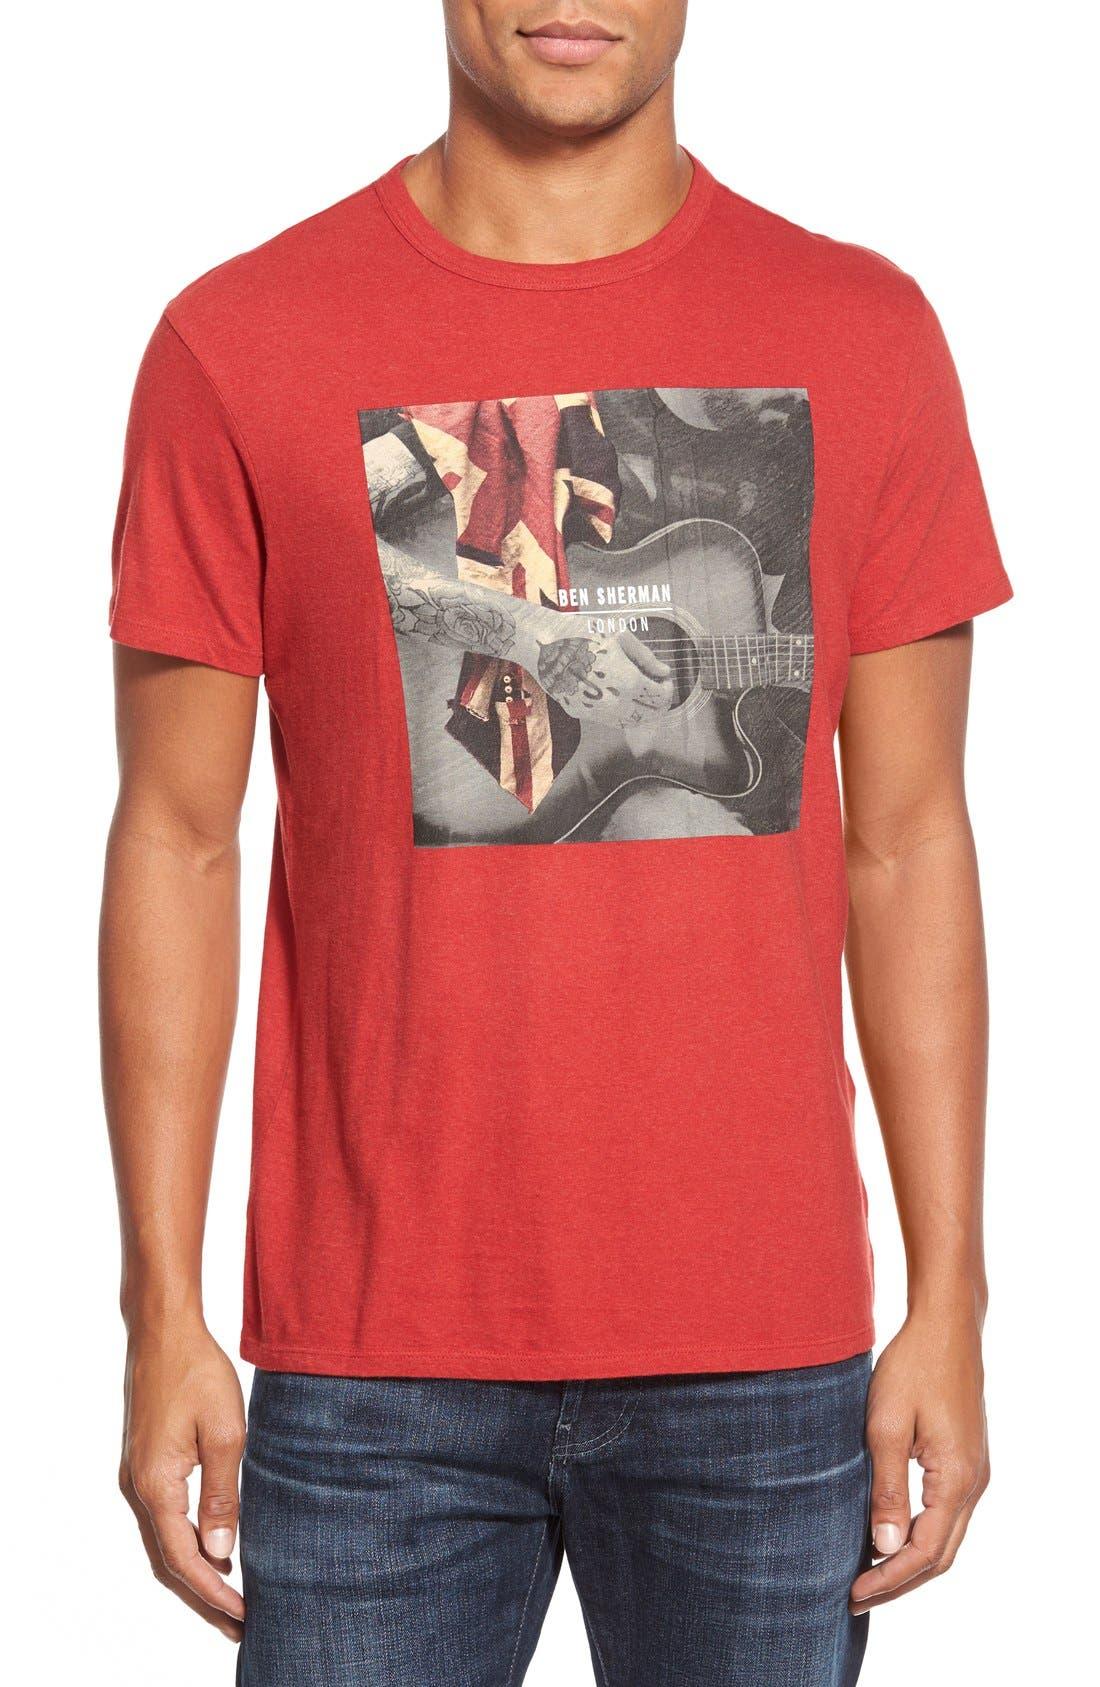 BEN SHERMAN 'Guitar Union Jack' T-Shirt, Main, color, 601